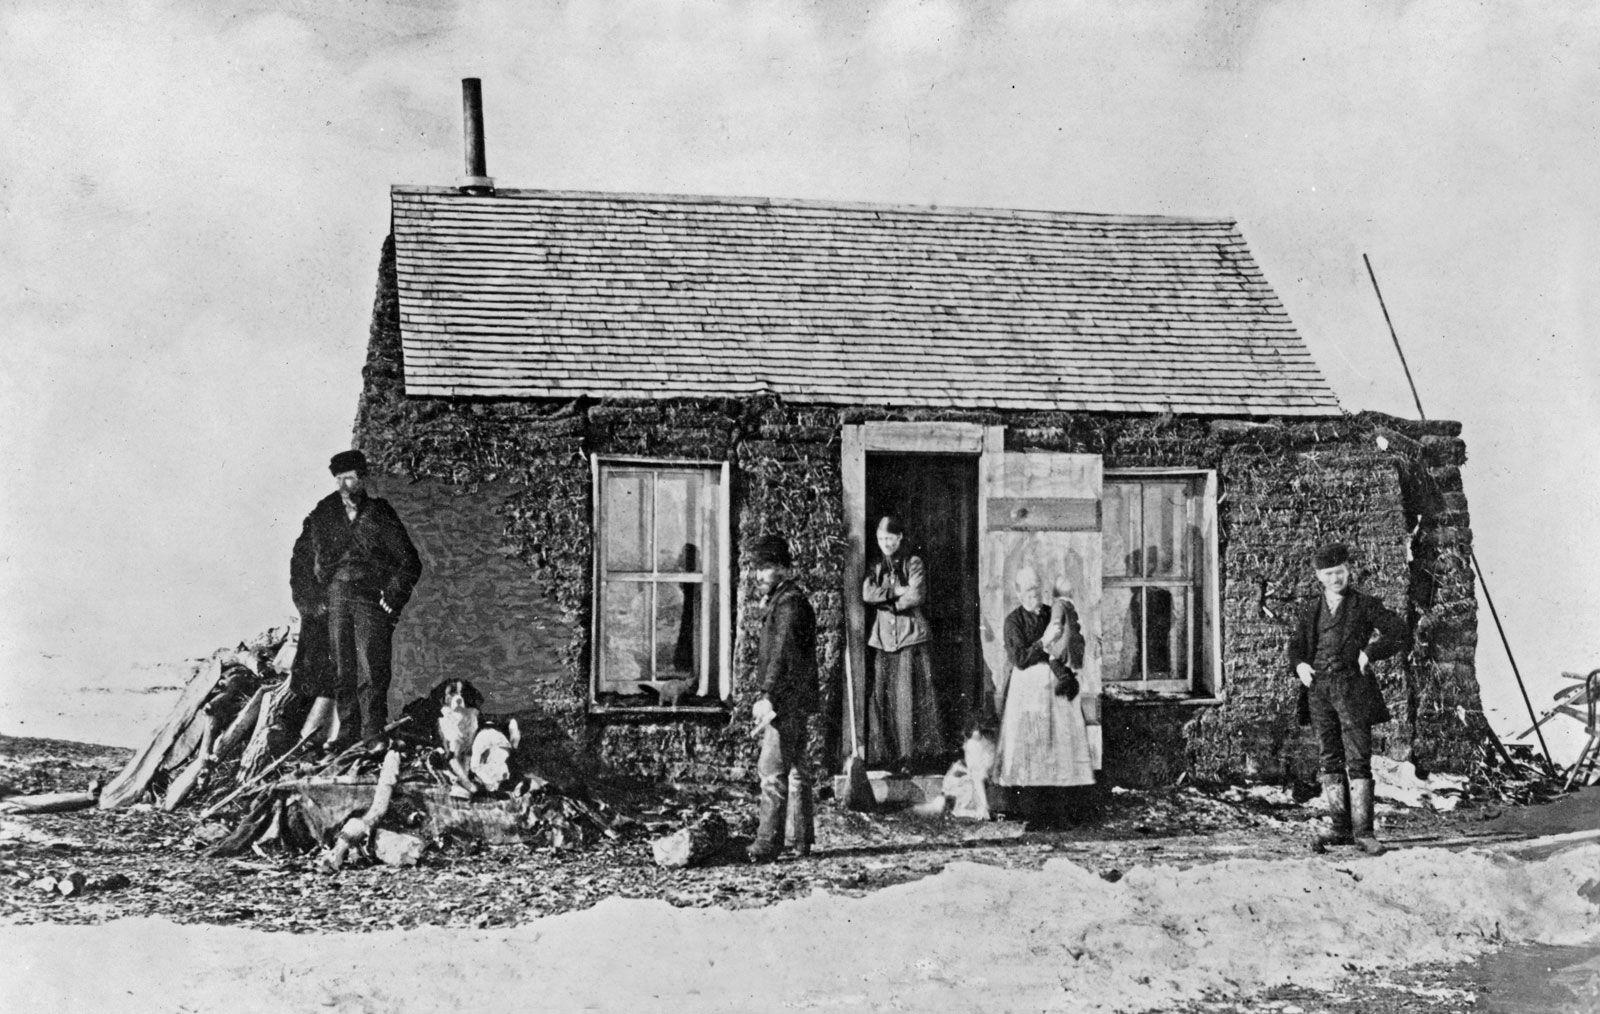 Free Multnoma Falls Winter Wallpaper South Dakota Settlers Outside Their Sod House In Late